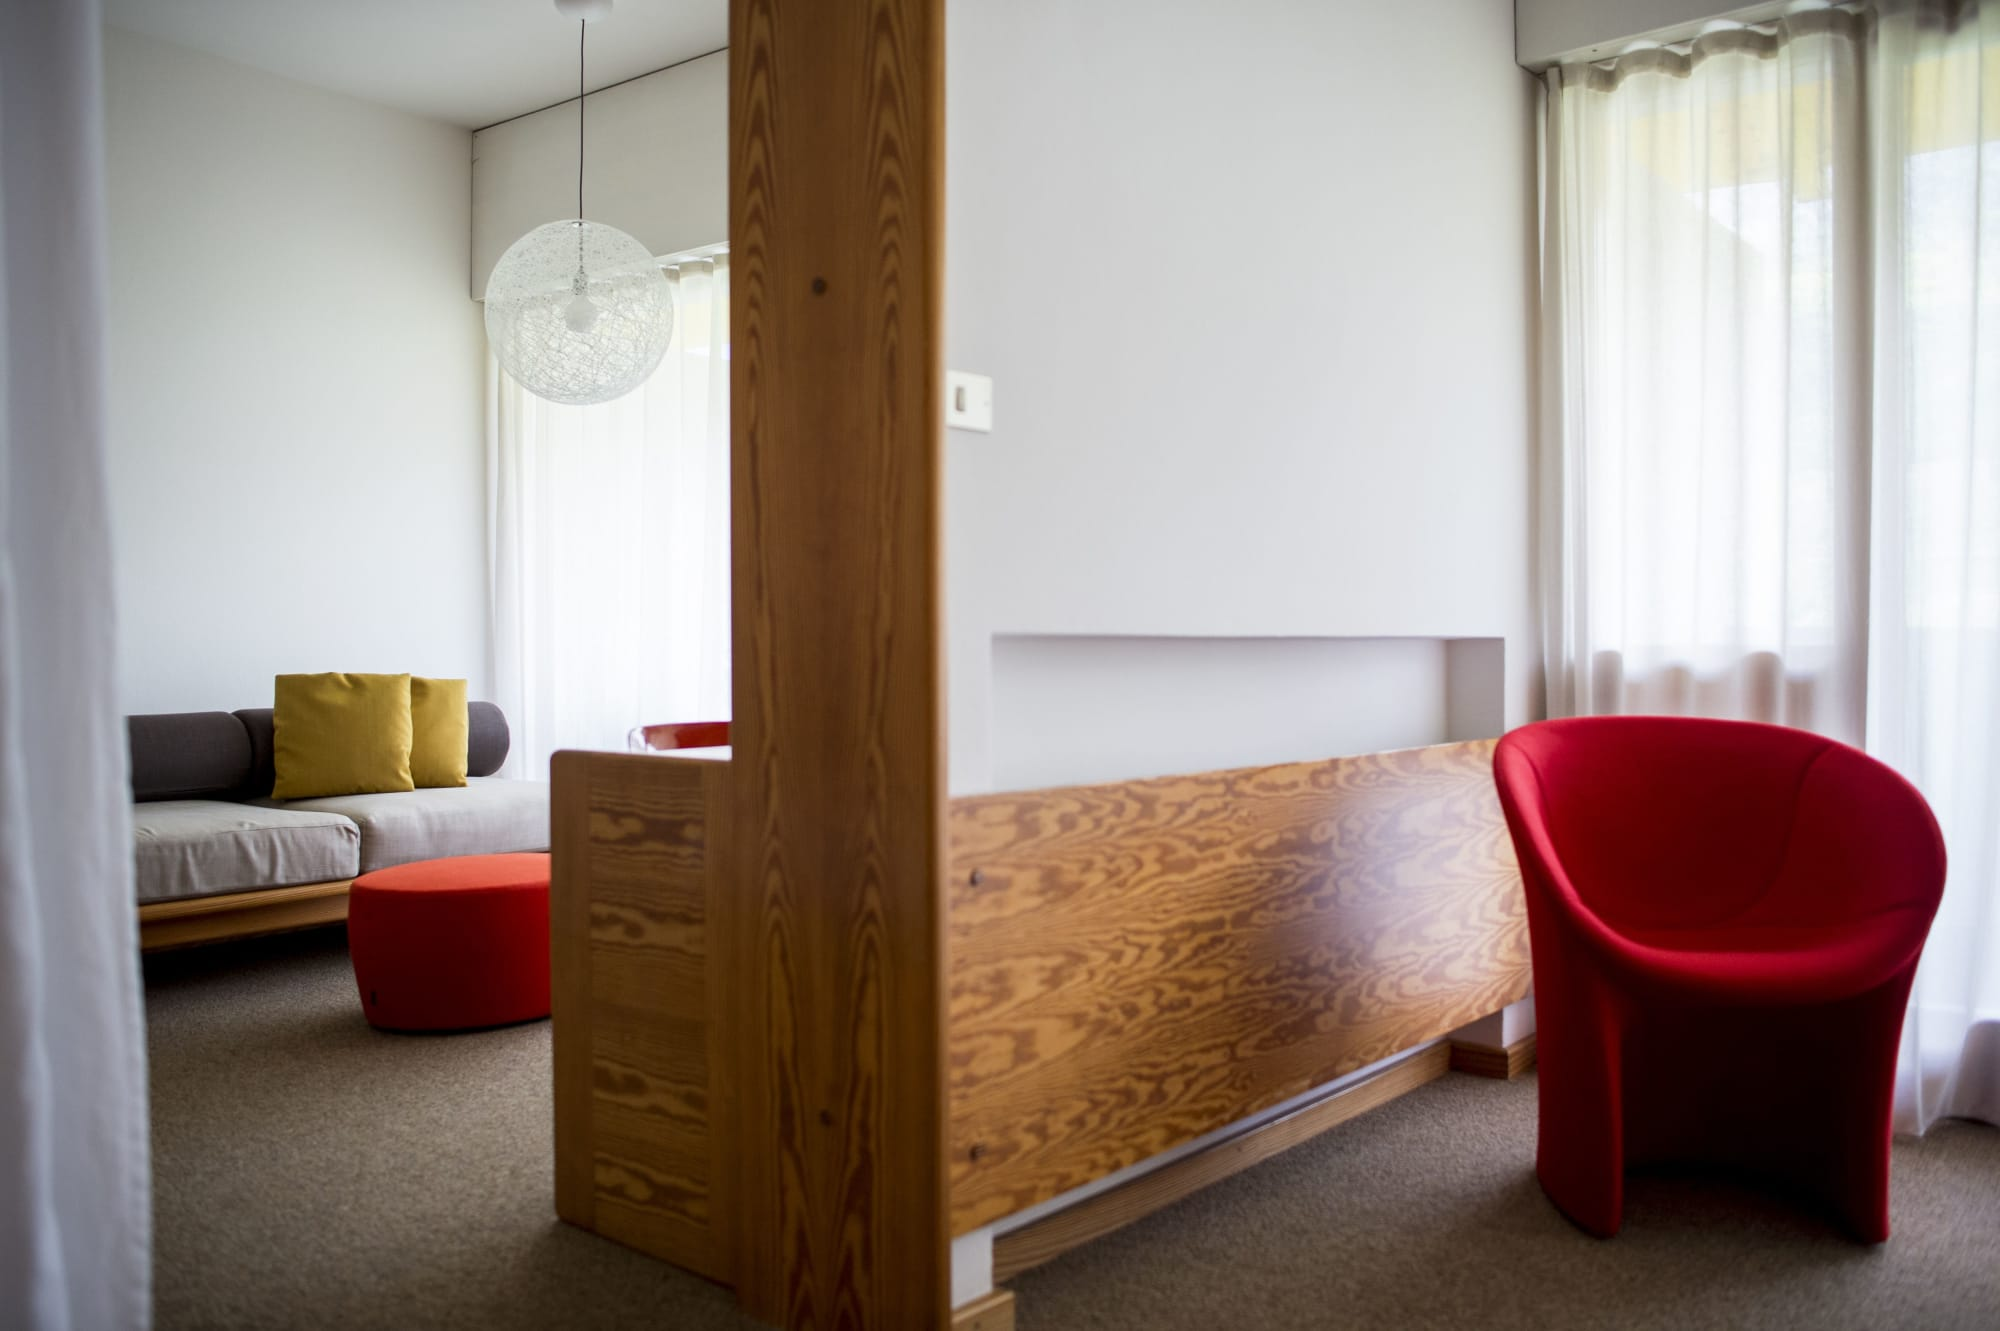 Red modern retro chair